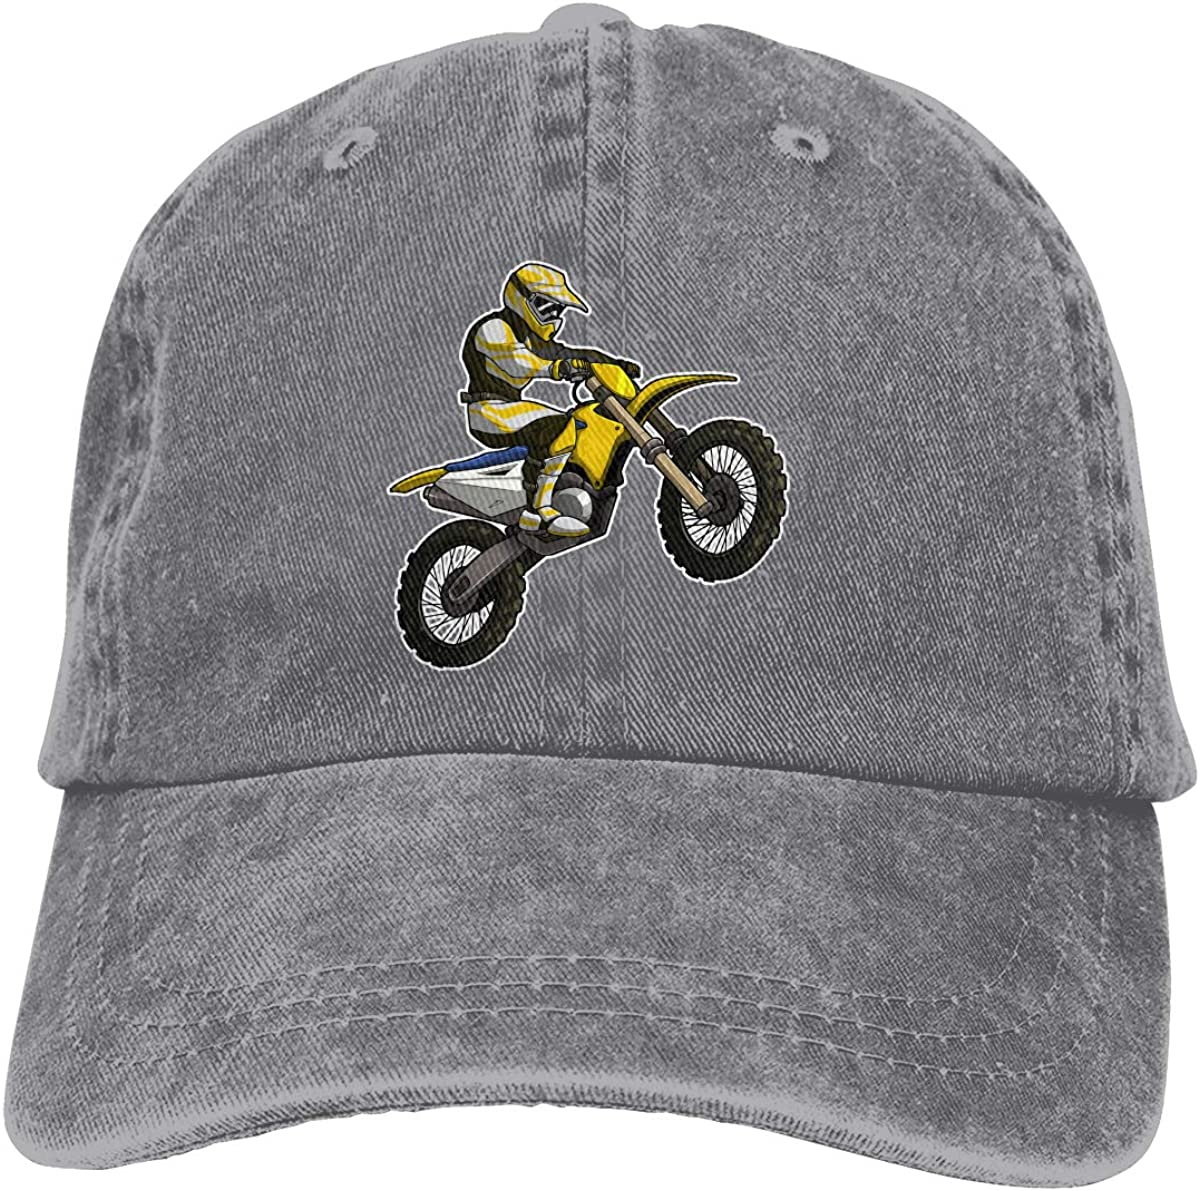 Men Women Motocross Vintage Washed Dad Hat Cute Adjustable Baseball Cap